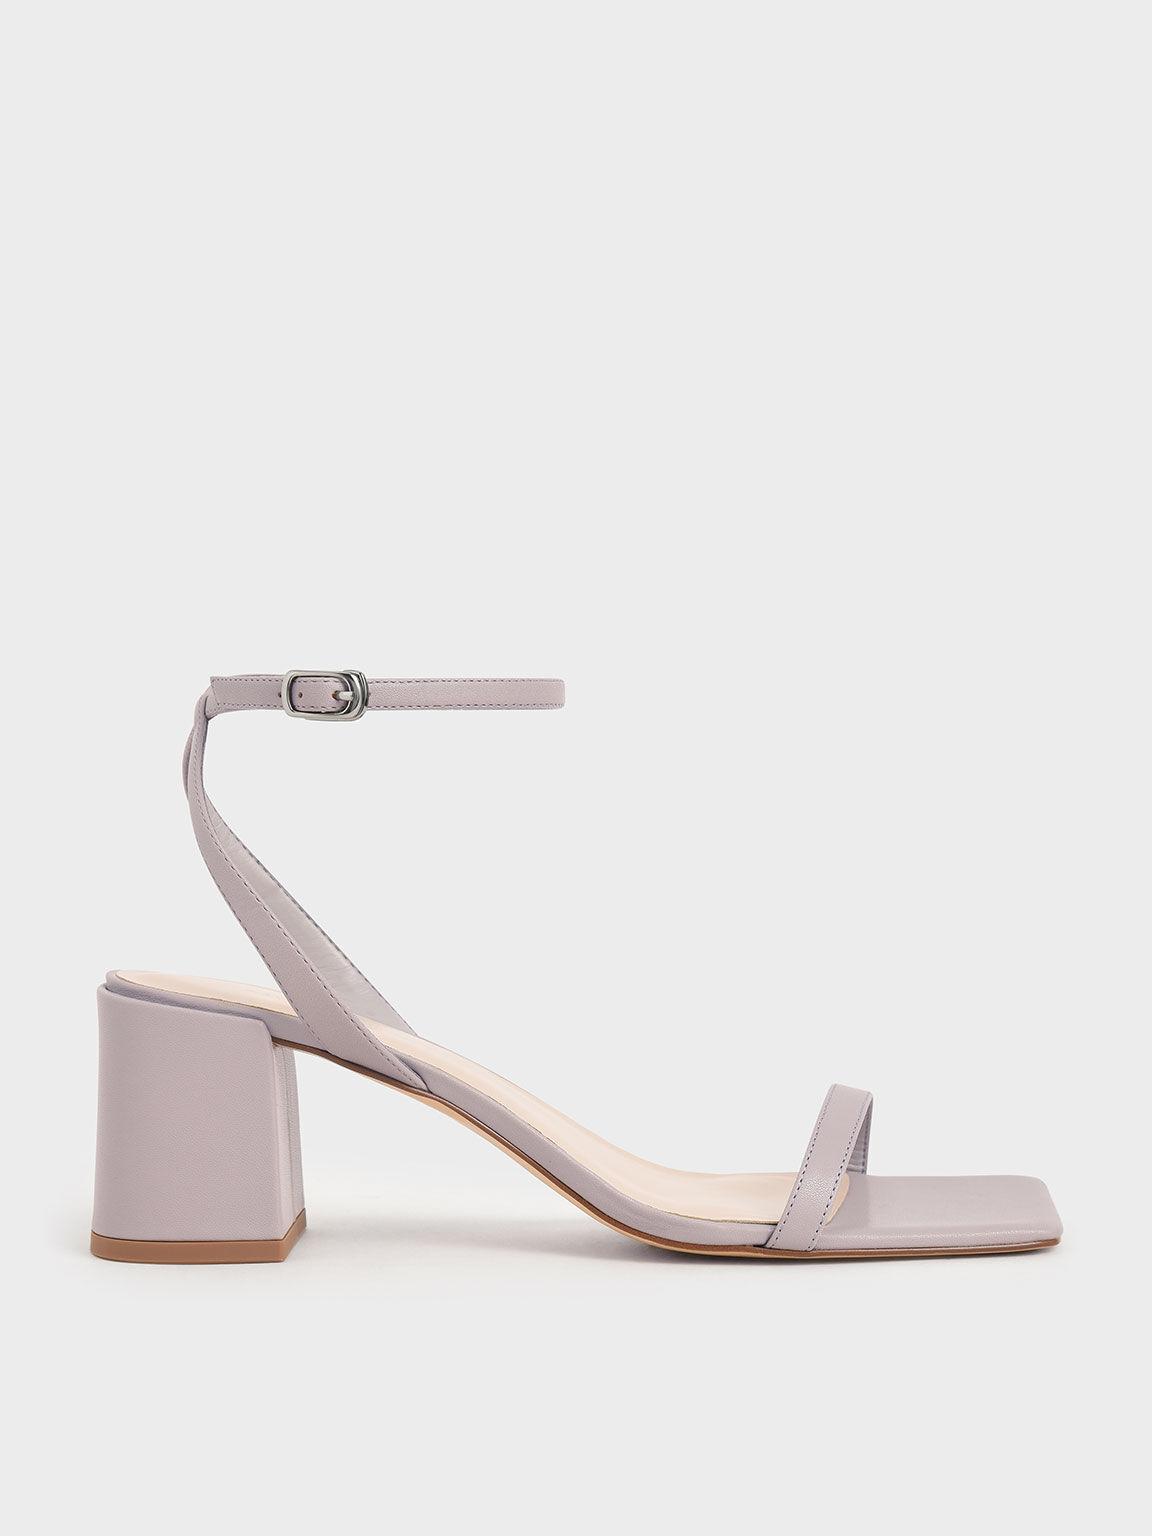 Ankle Strap Block Heel Sandals, Lilac, hi-res